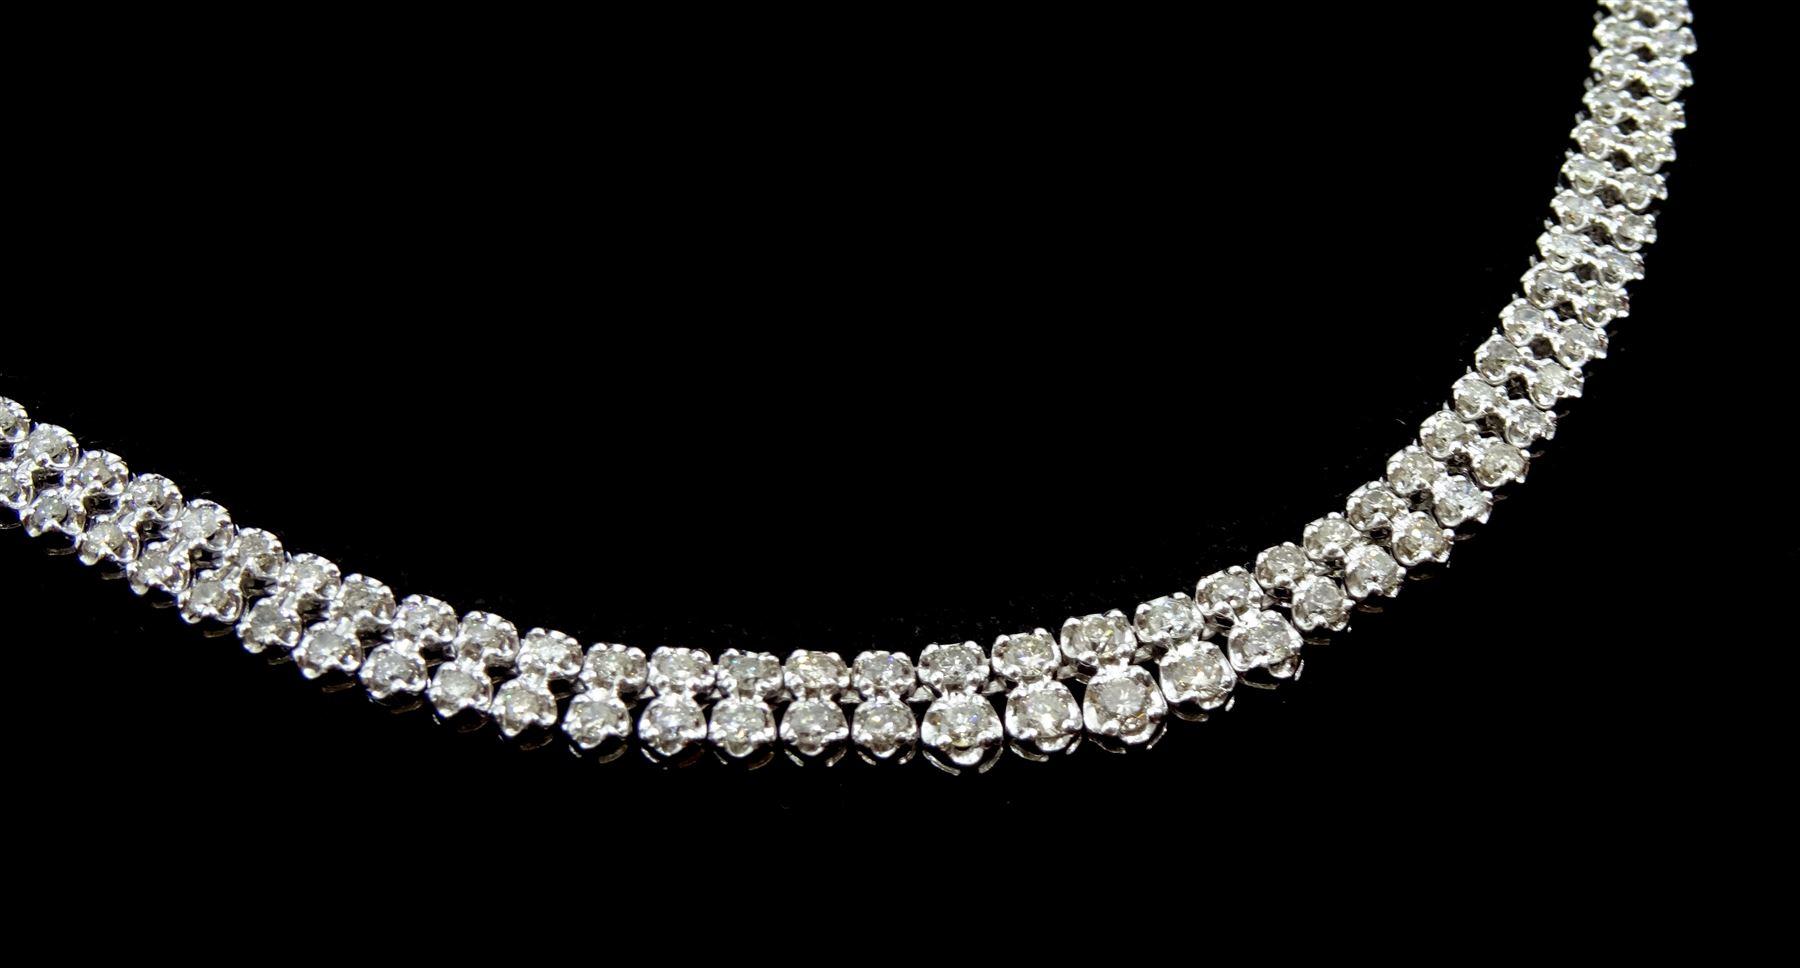 Platinum double row round brilliant cut diamond necklace - Image 2 of 3